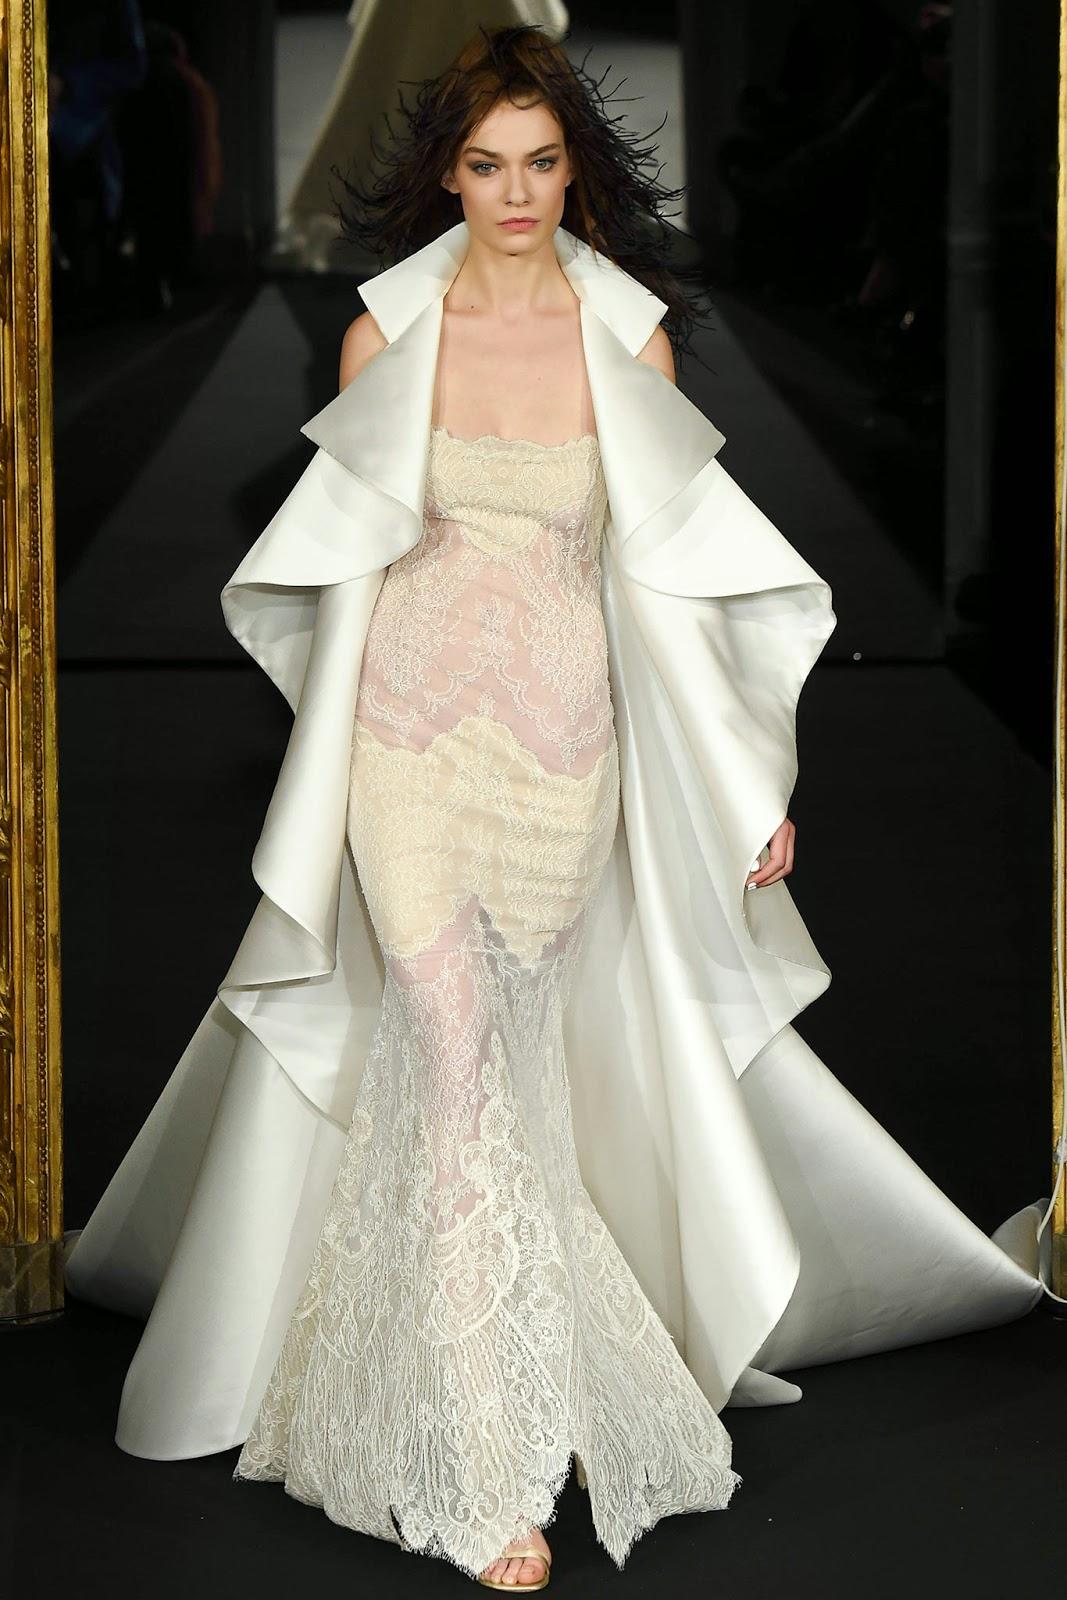 f619a7fb1c0c9 أزياء مفعمة بالأناقة والجمال من Alexis Mabille لأسبوع الموضة بباريس ...